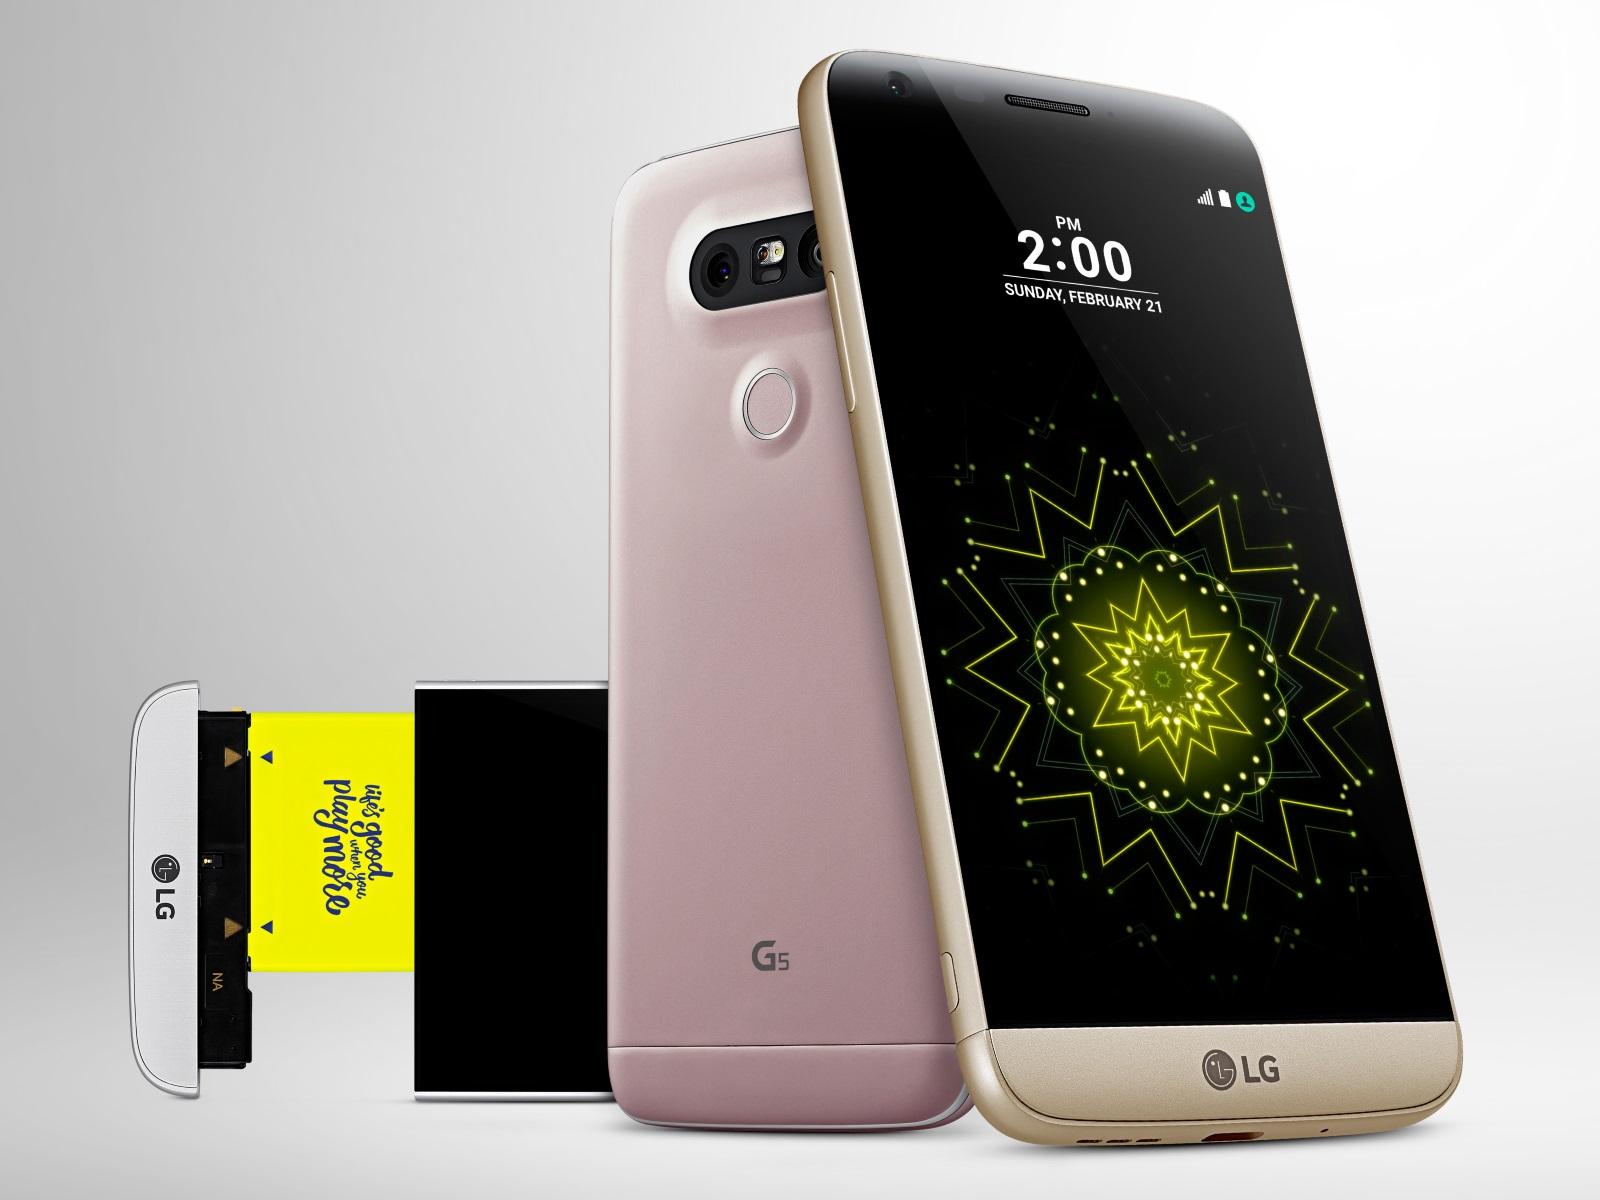 lg g5 data premiery